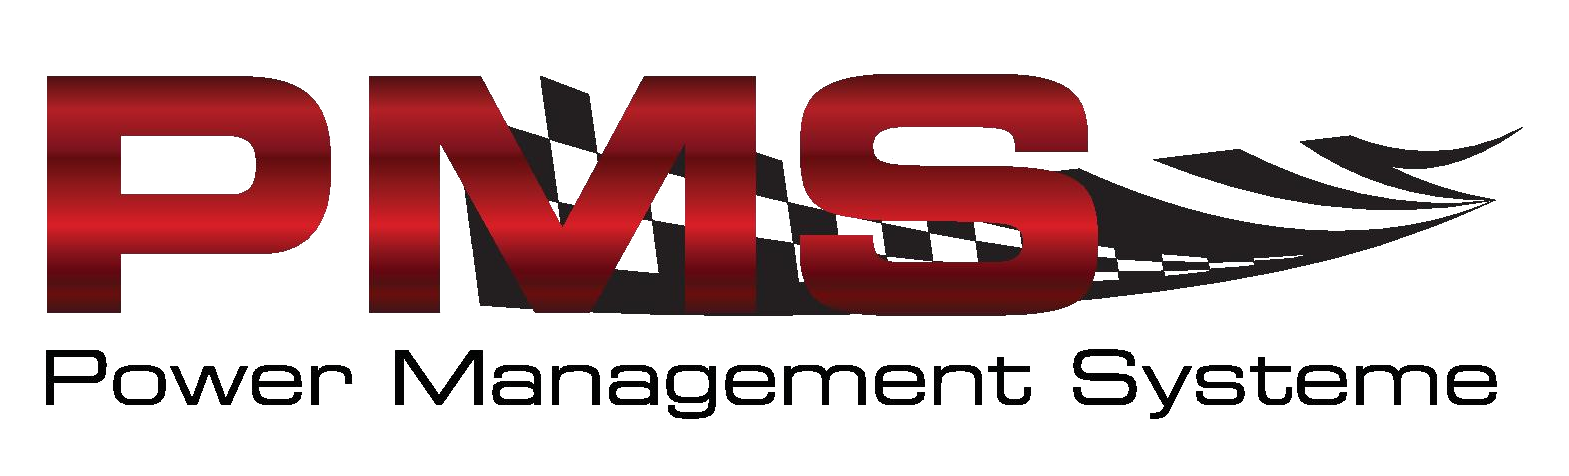 Logo vecto page 001 ss fond 1